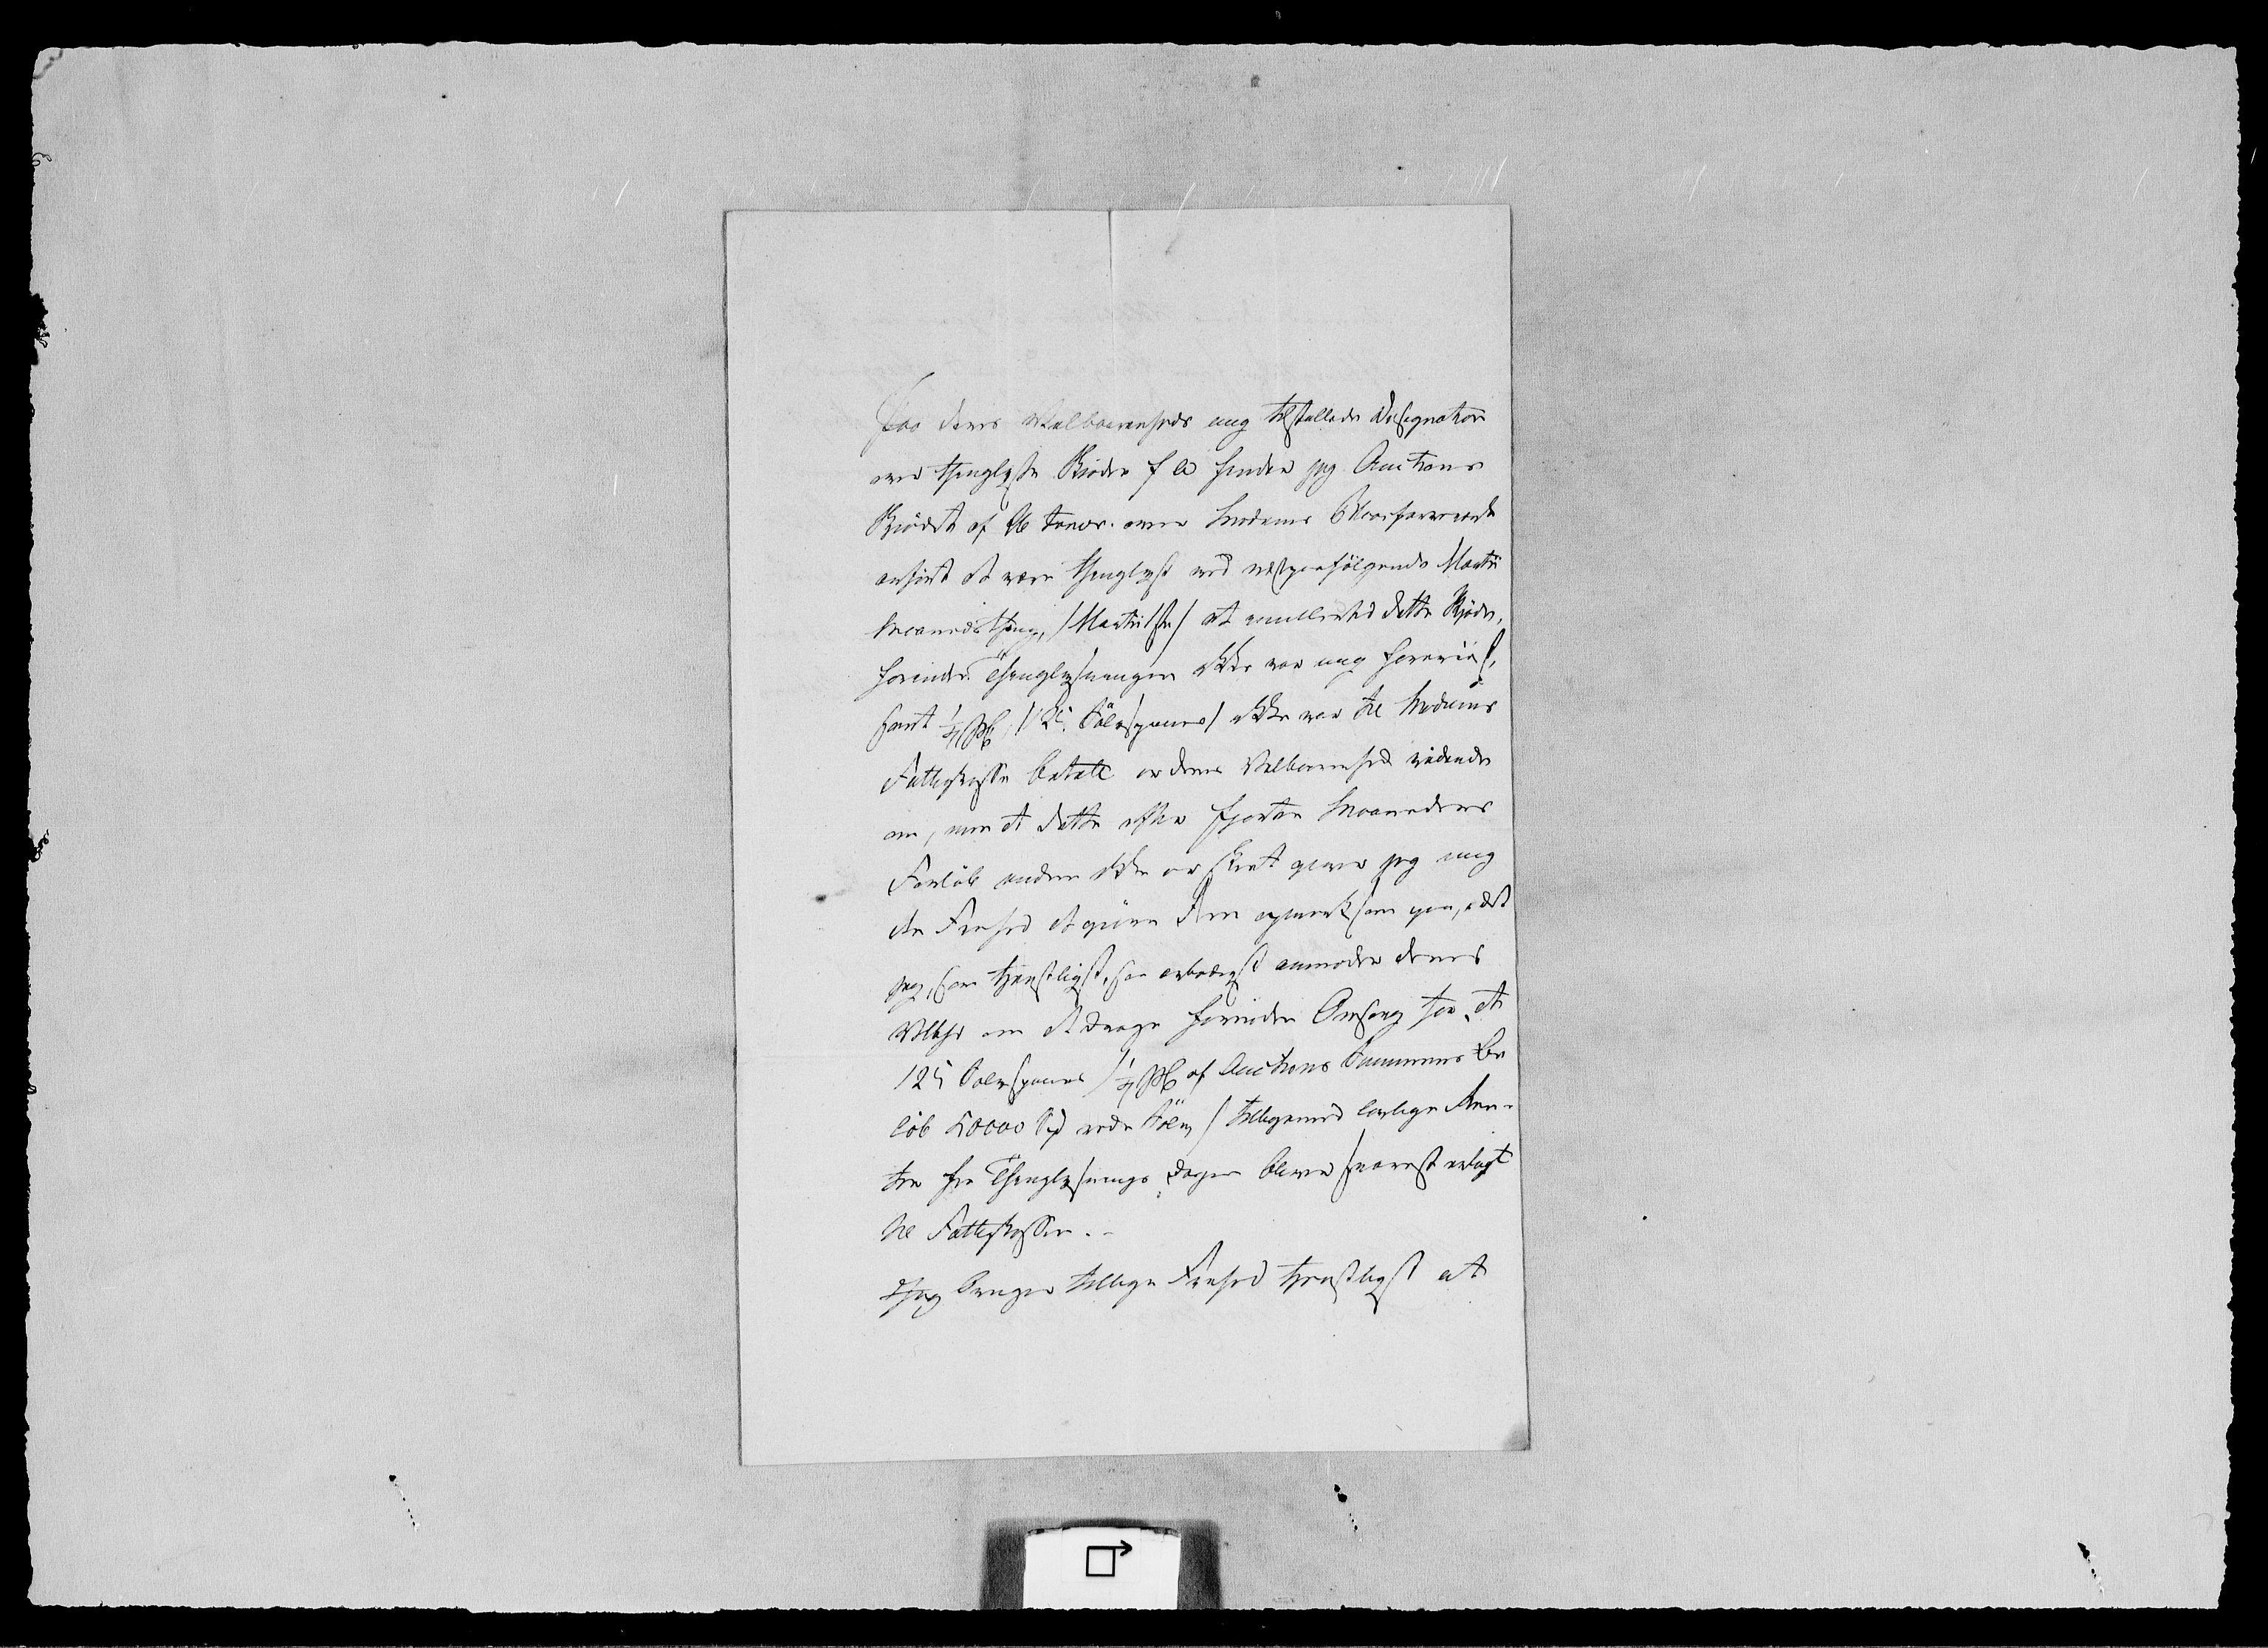 RA, Modums Blaafarveværk, G/Gj/L0384, 1825-1849, s. 2